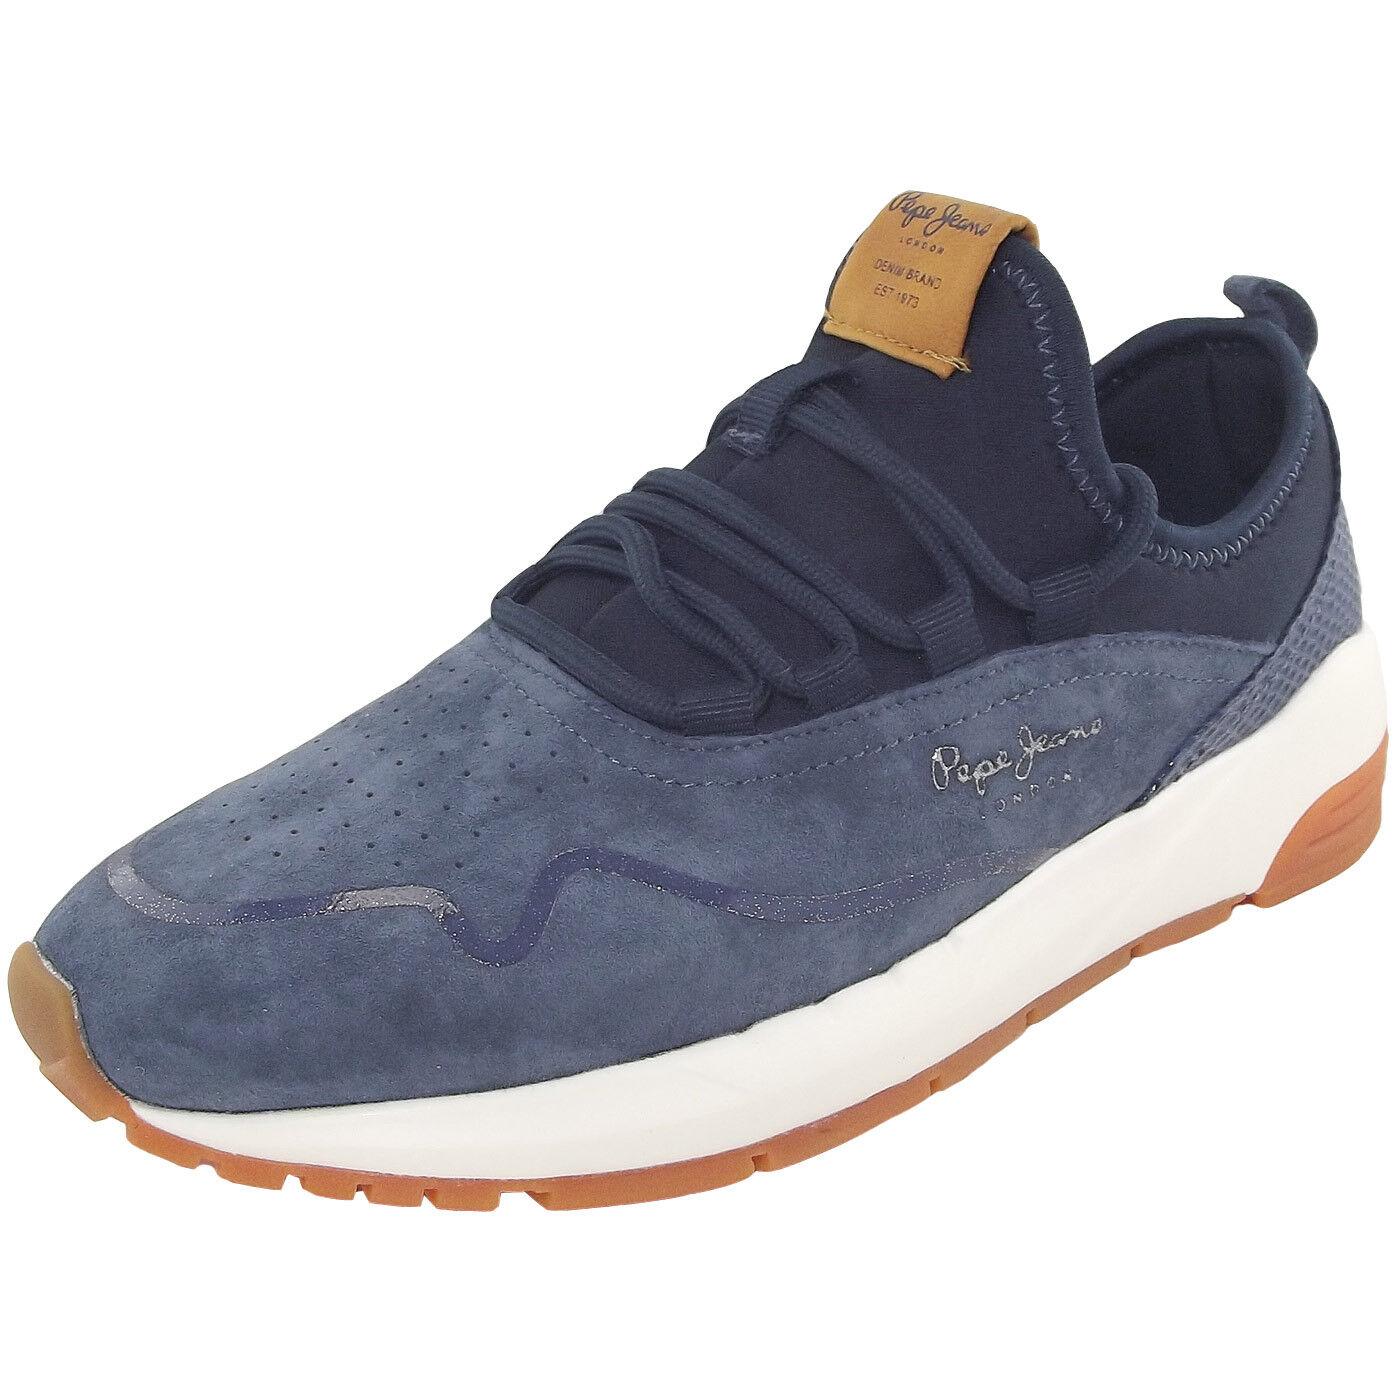 Pepe Jeans Foster Light Damen Turnschuhe dunkelblau (marine)